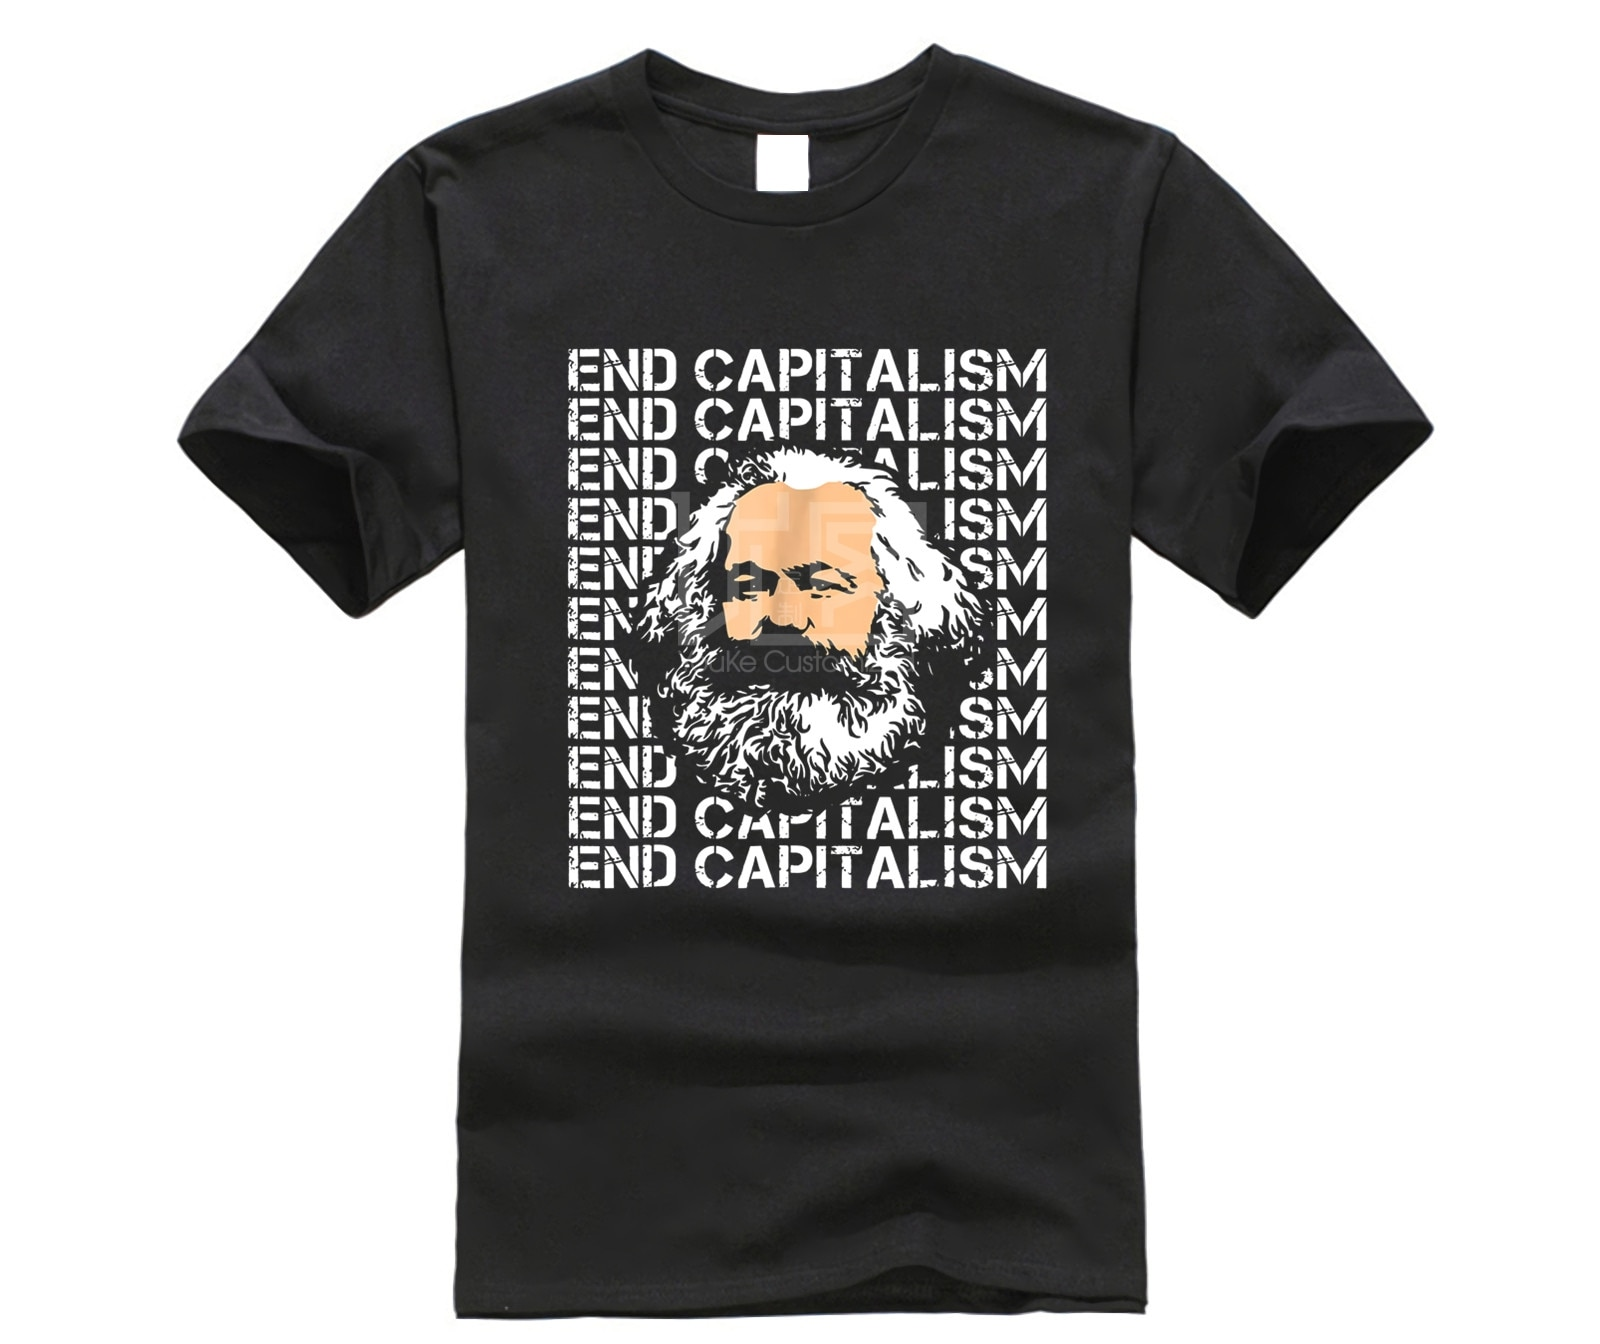 Camisa masculina karl marx final capitalismo socialista esquerdista engraçado t camisa